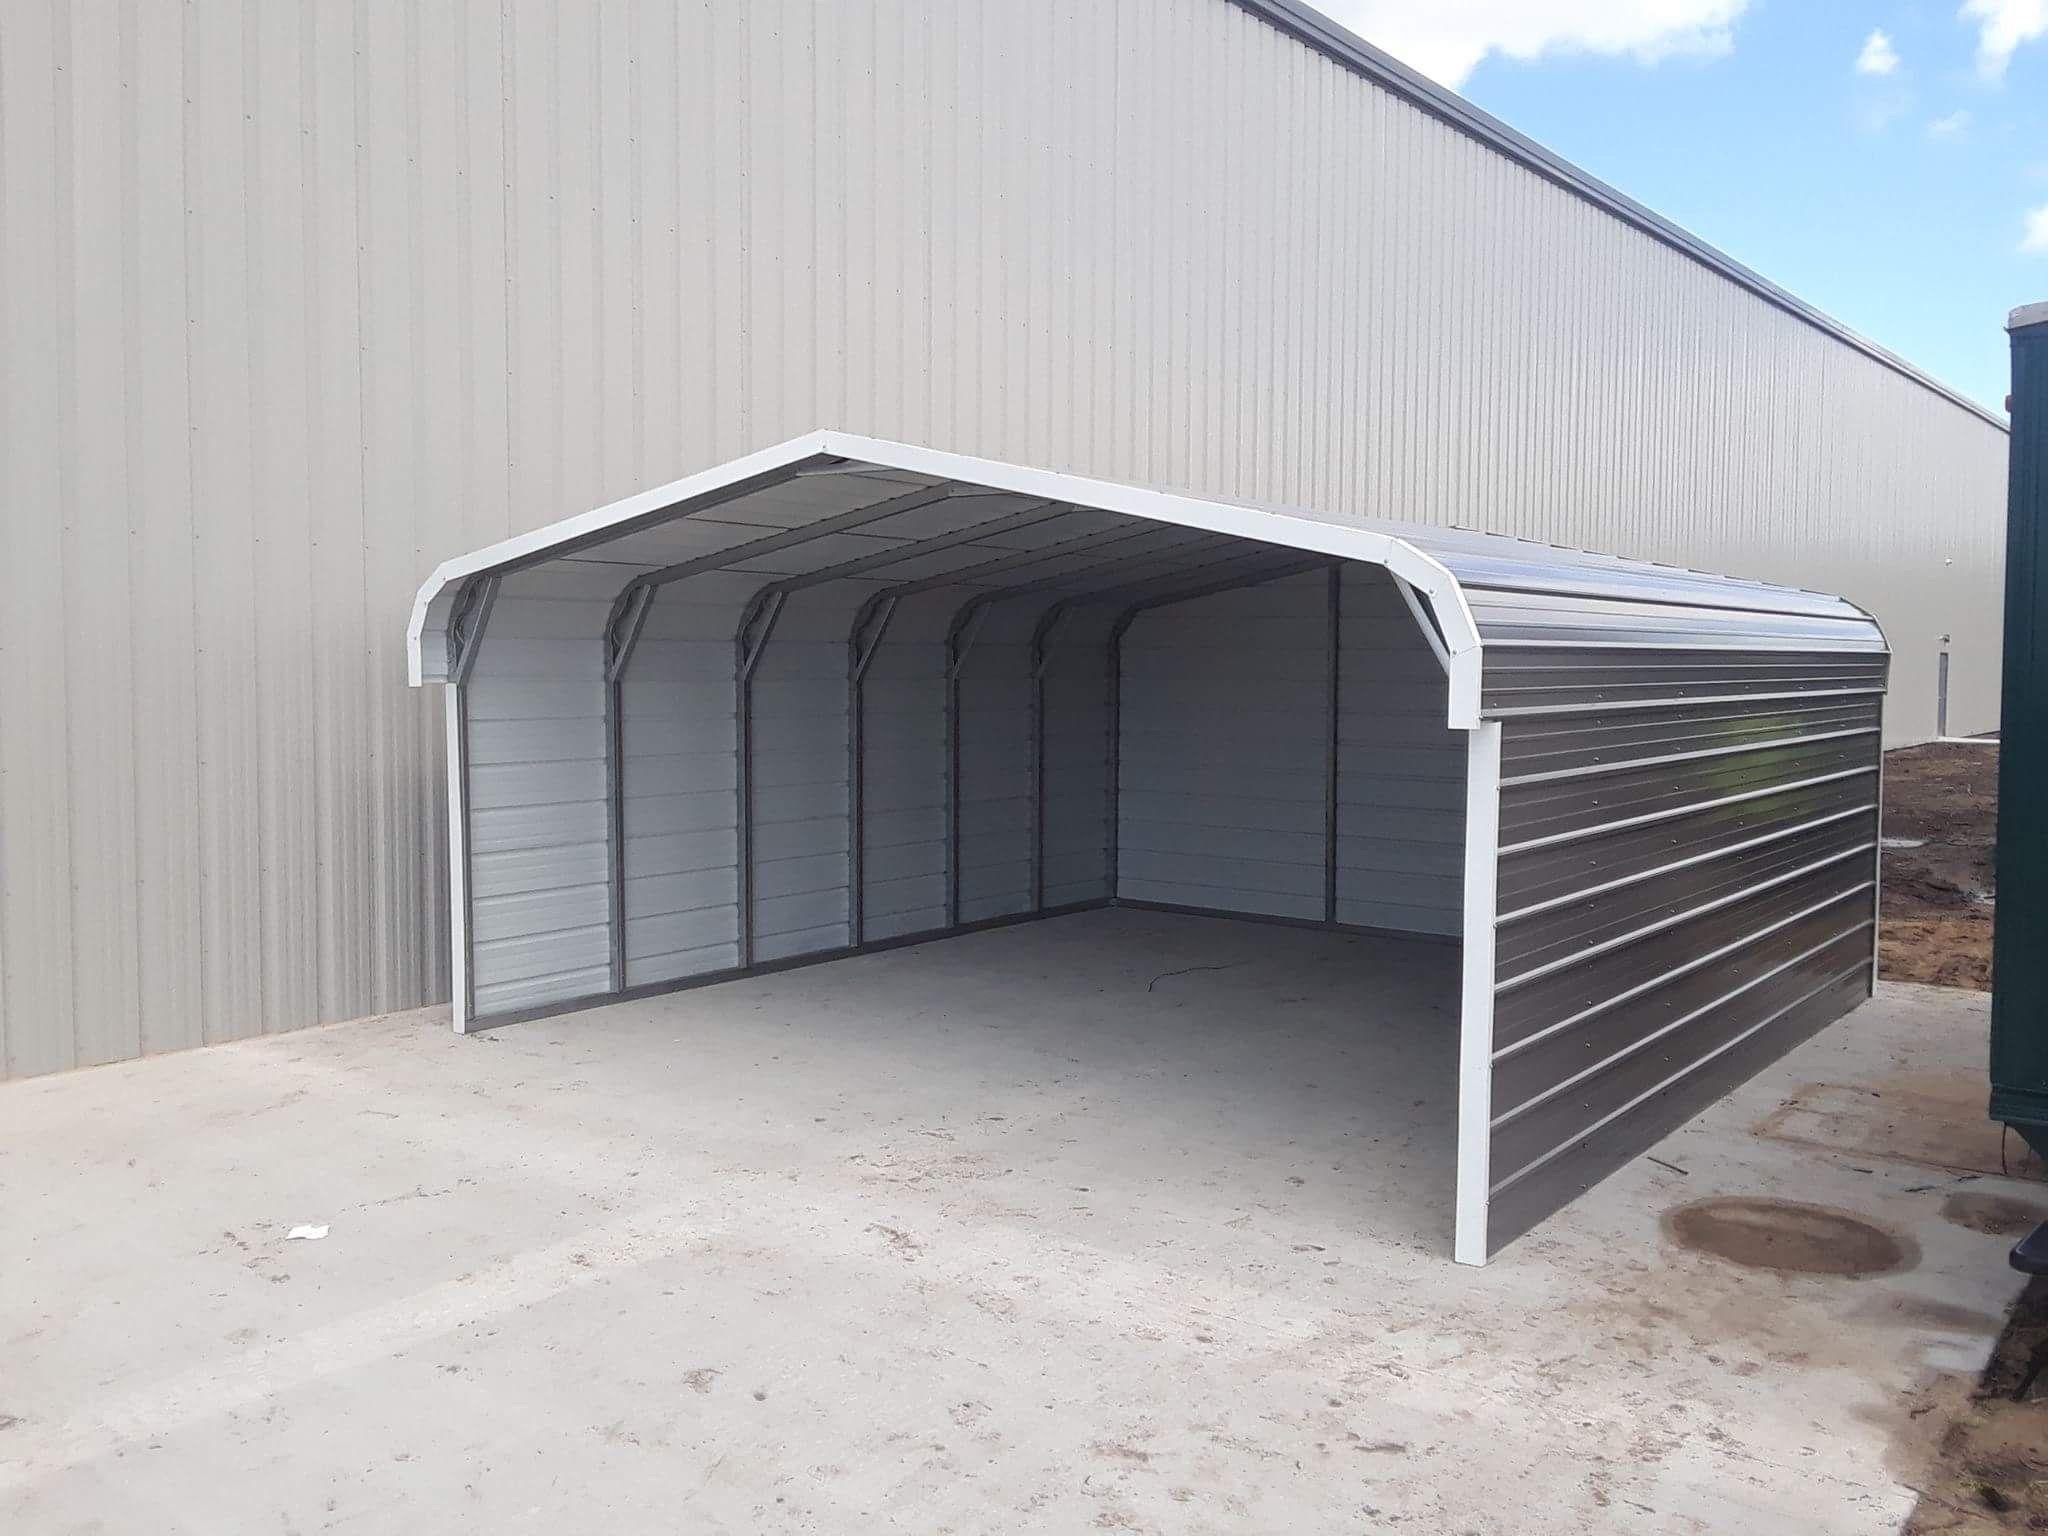 20x21x8 Metal Storage Carport In Ludington Mi Carport Steel Carports Metal Carports